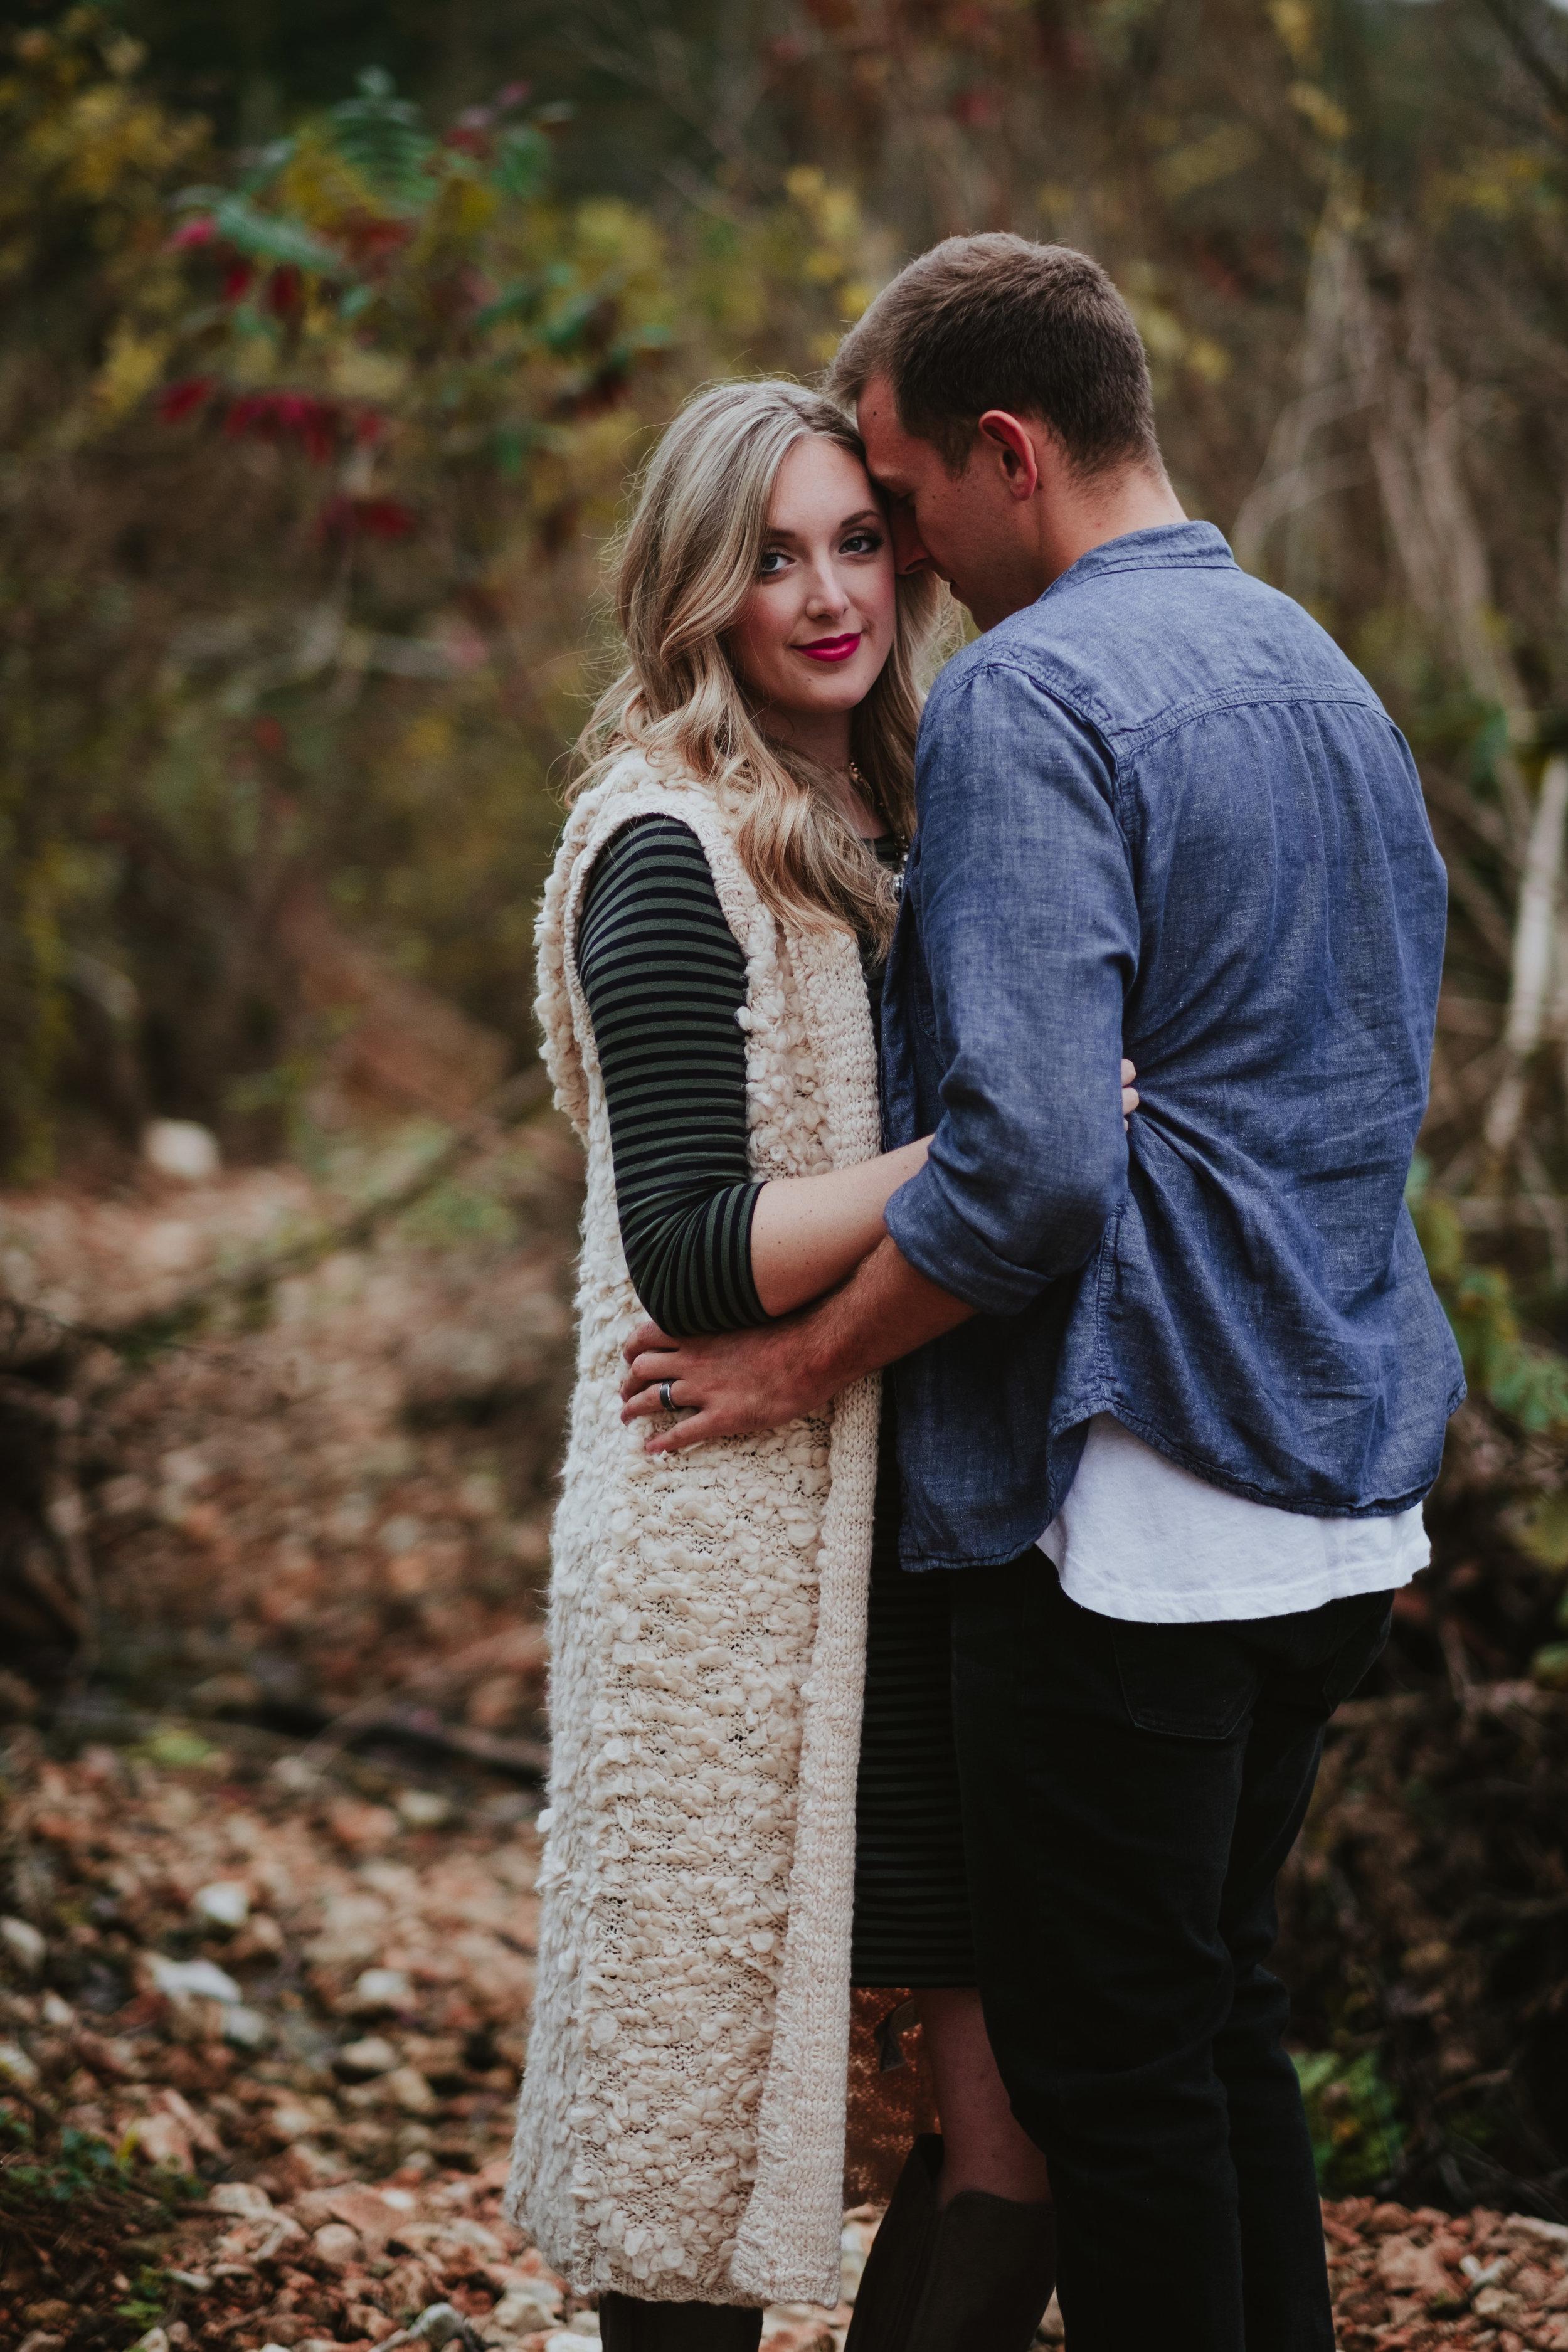 Micah.Chris.Maternity.2016.Delyn.Megan.Stirewalt-32.jpg